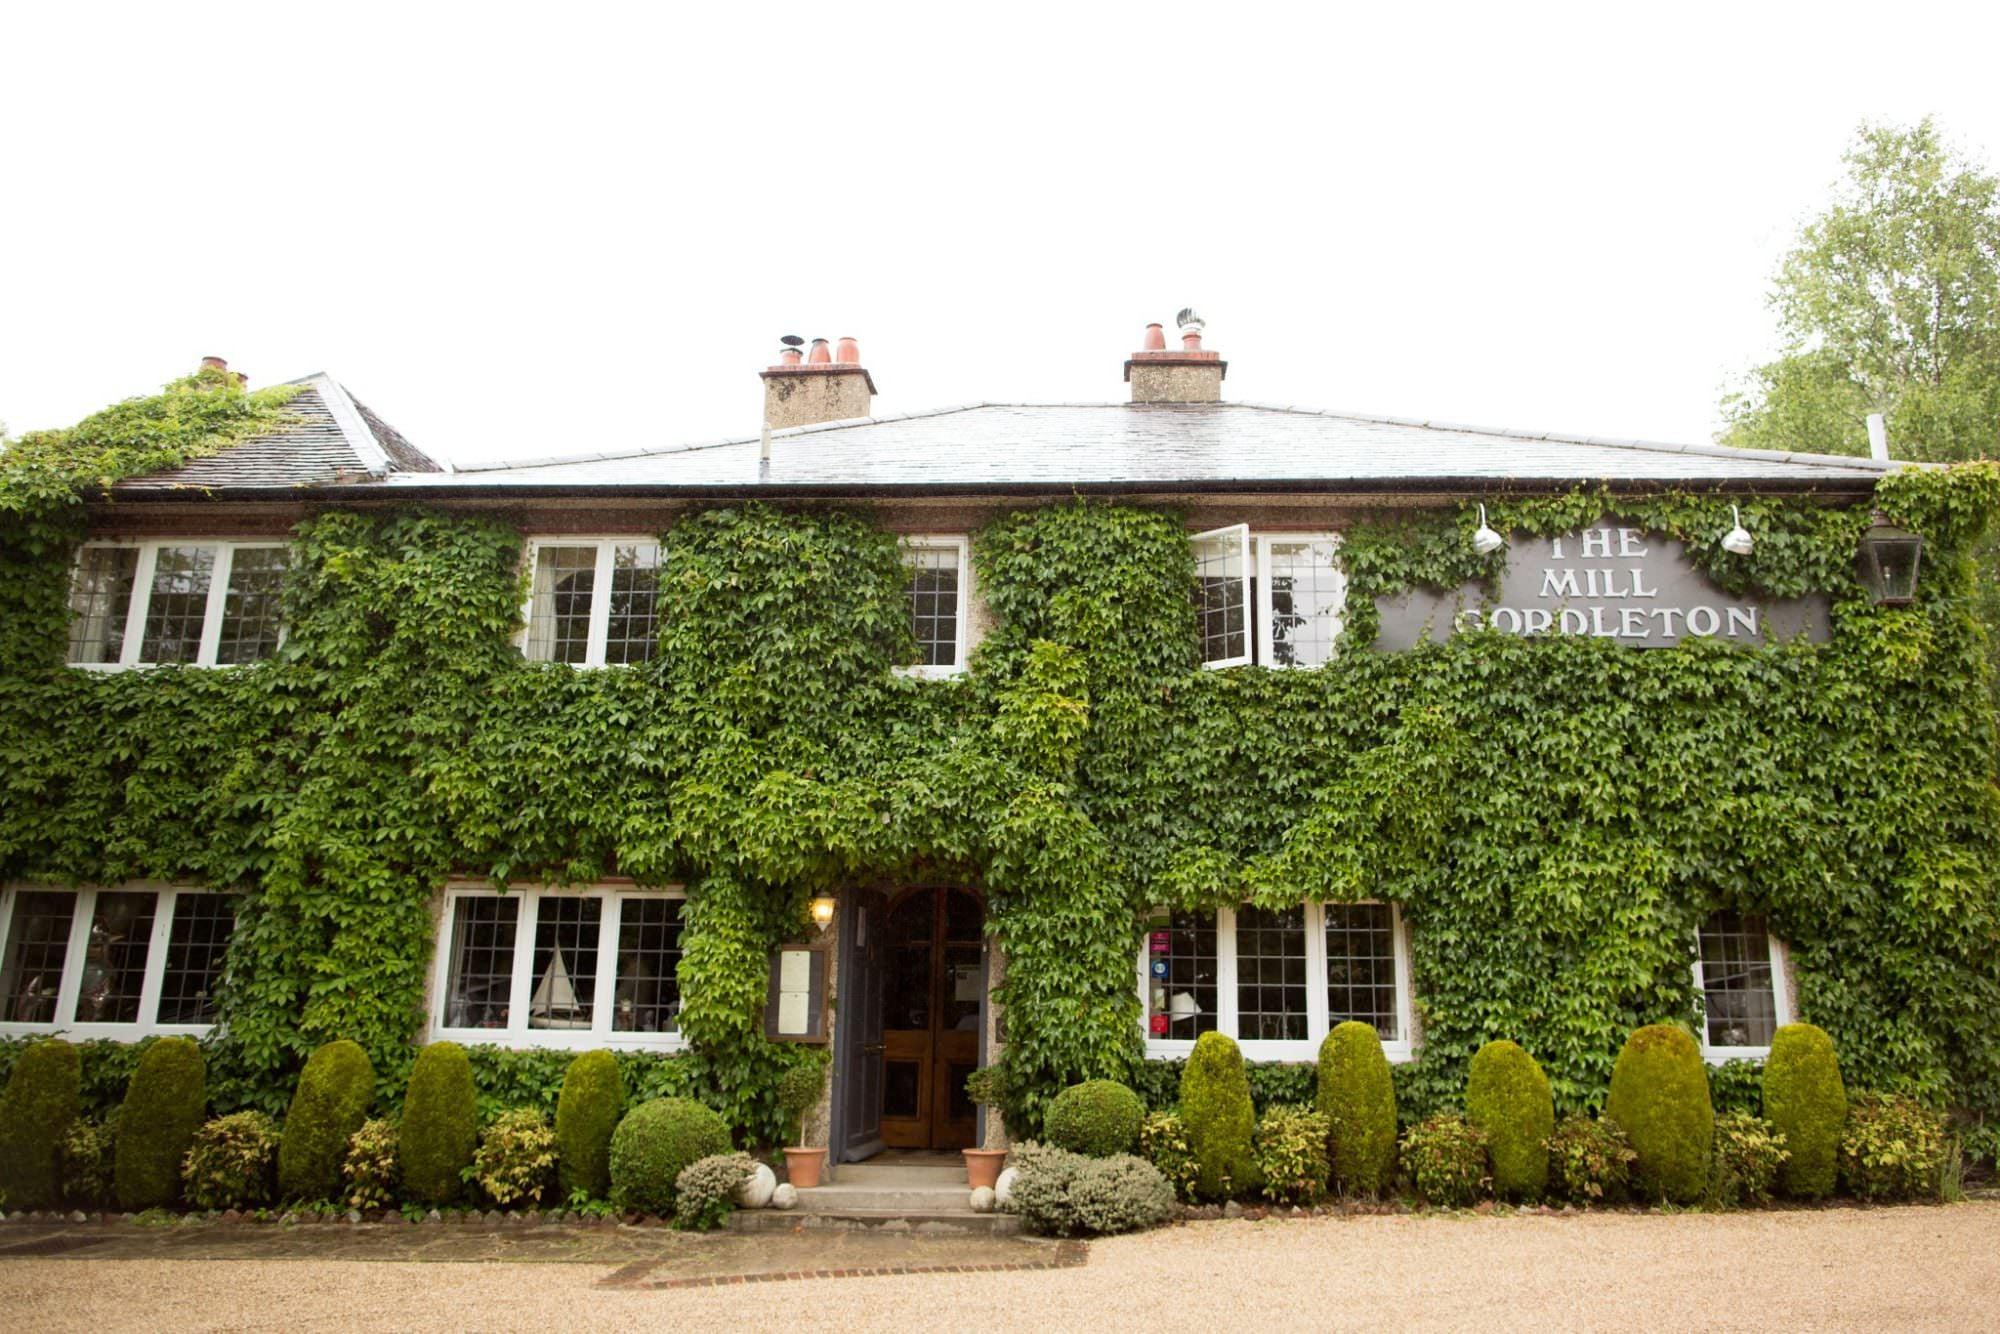 Gordleton Mill Hampshire Wedding Venue